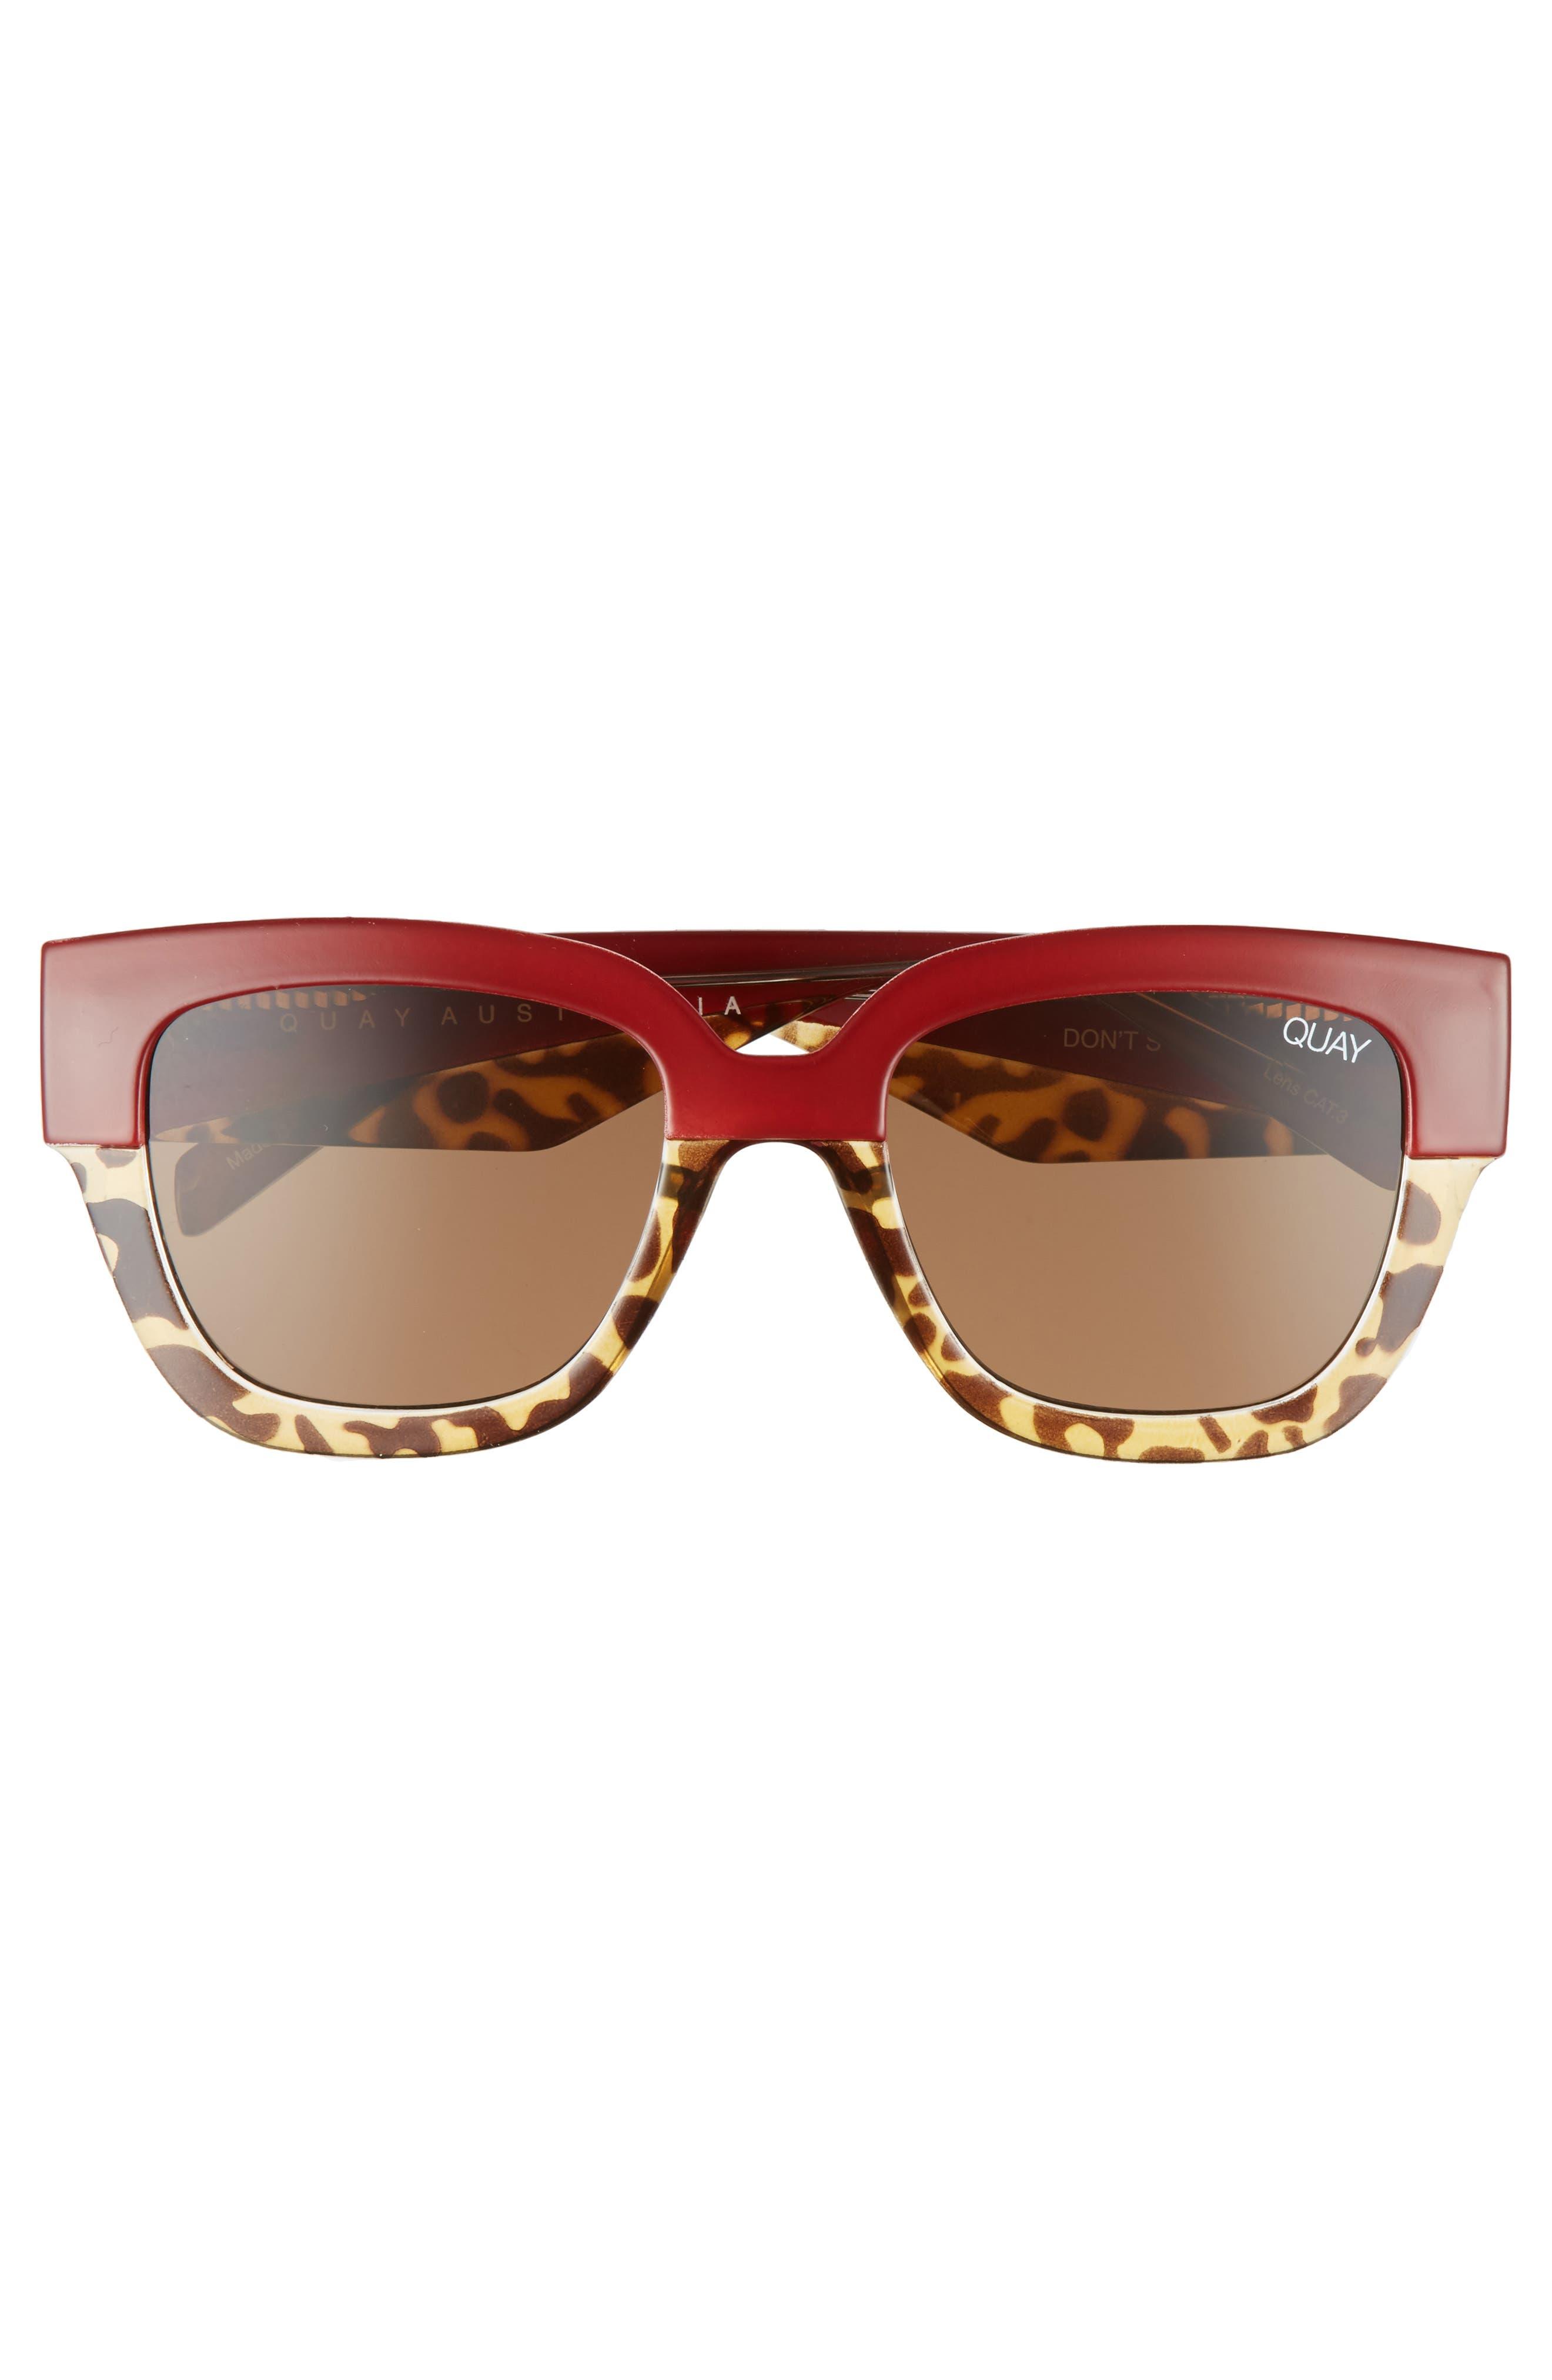 55mm Don't Stop Sunglasses,                             Alternate thumbnail 6, color,